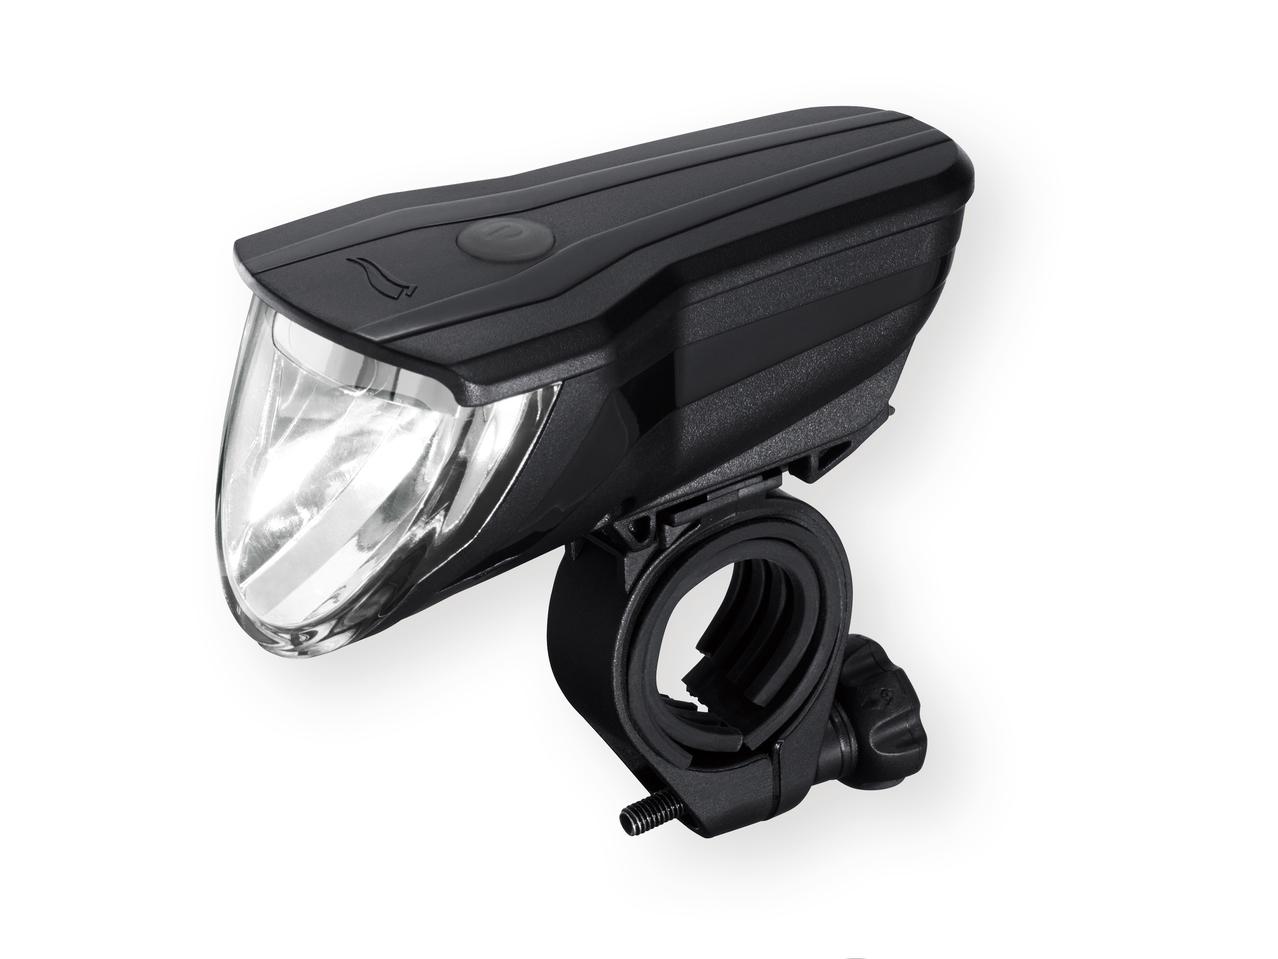 crivit set de luces led para bicicleta lidl espa a. Black Bedroom Furniture Sets. Home Design Ideas